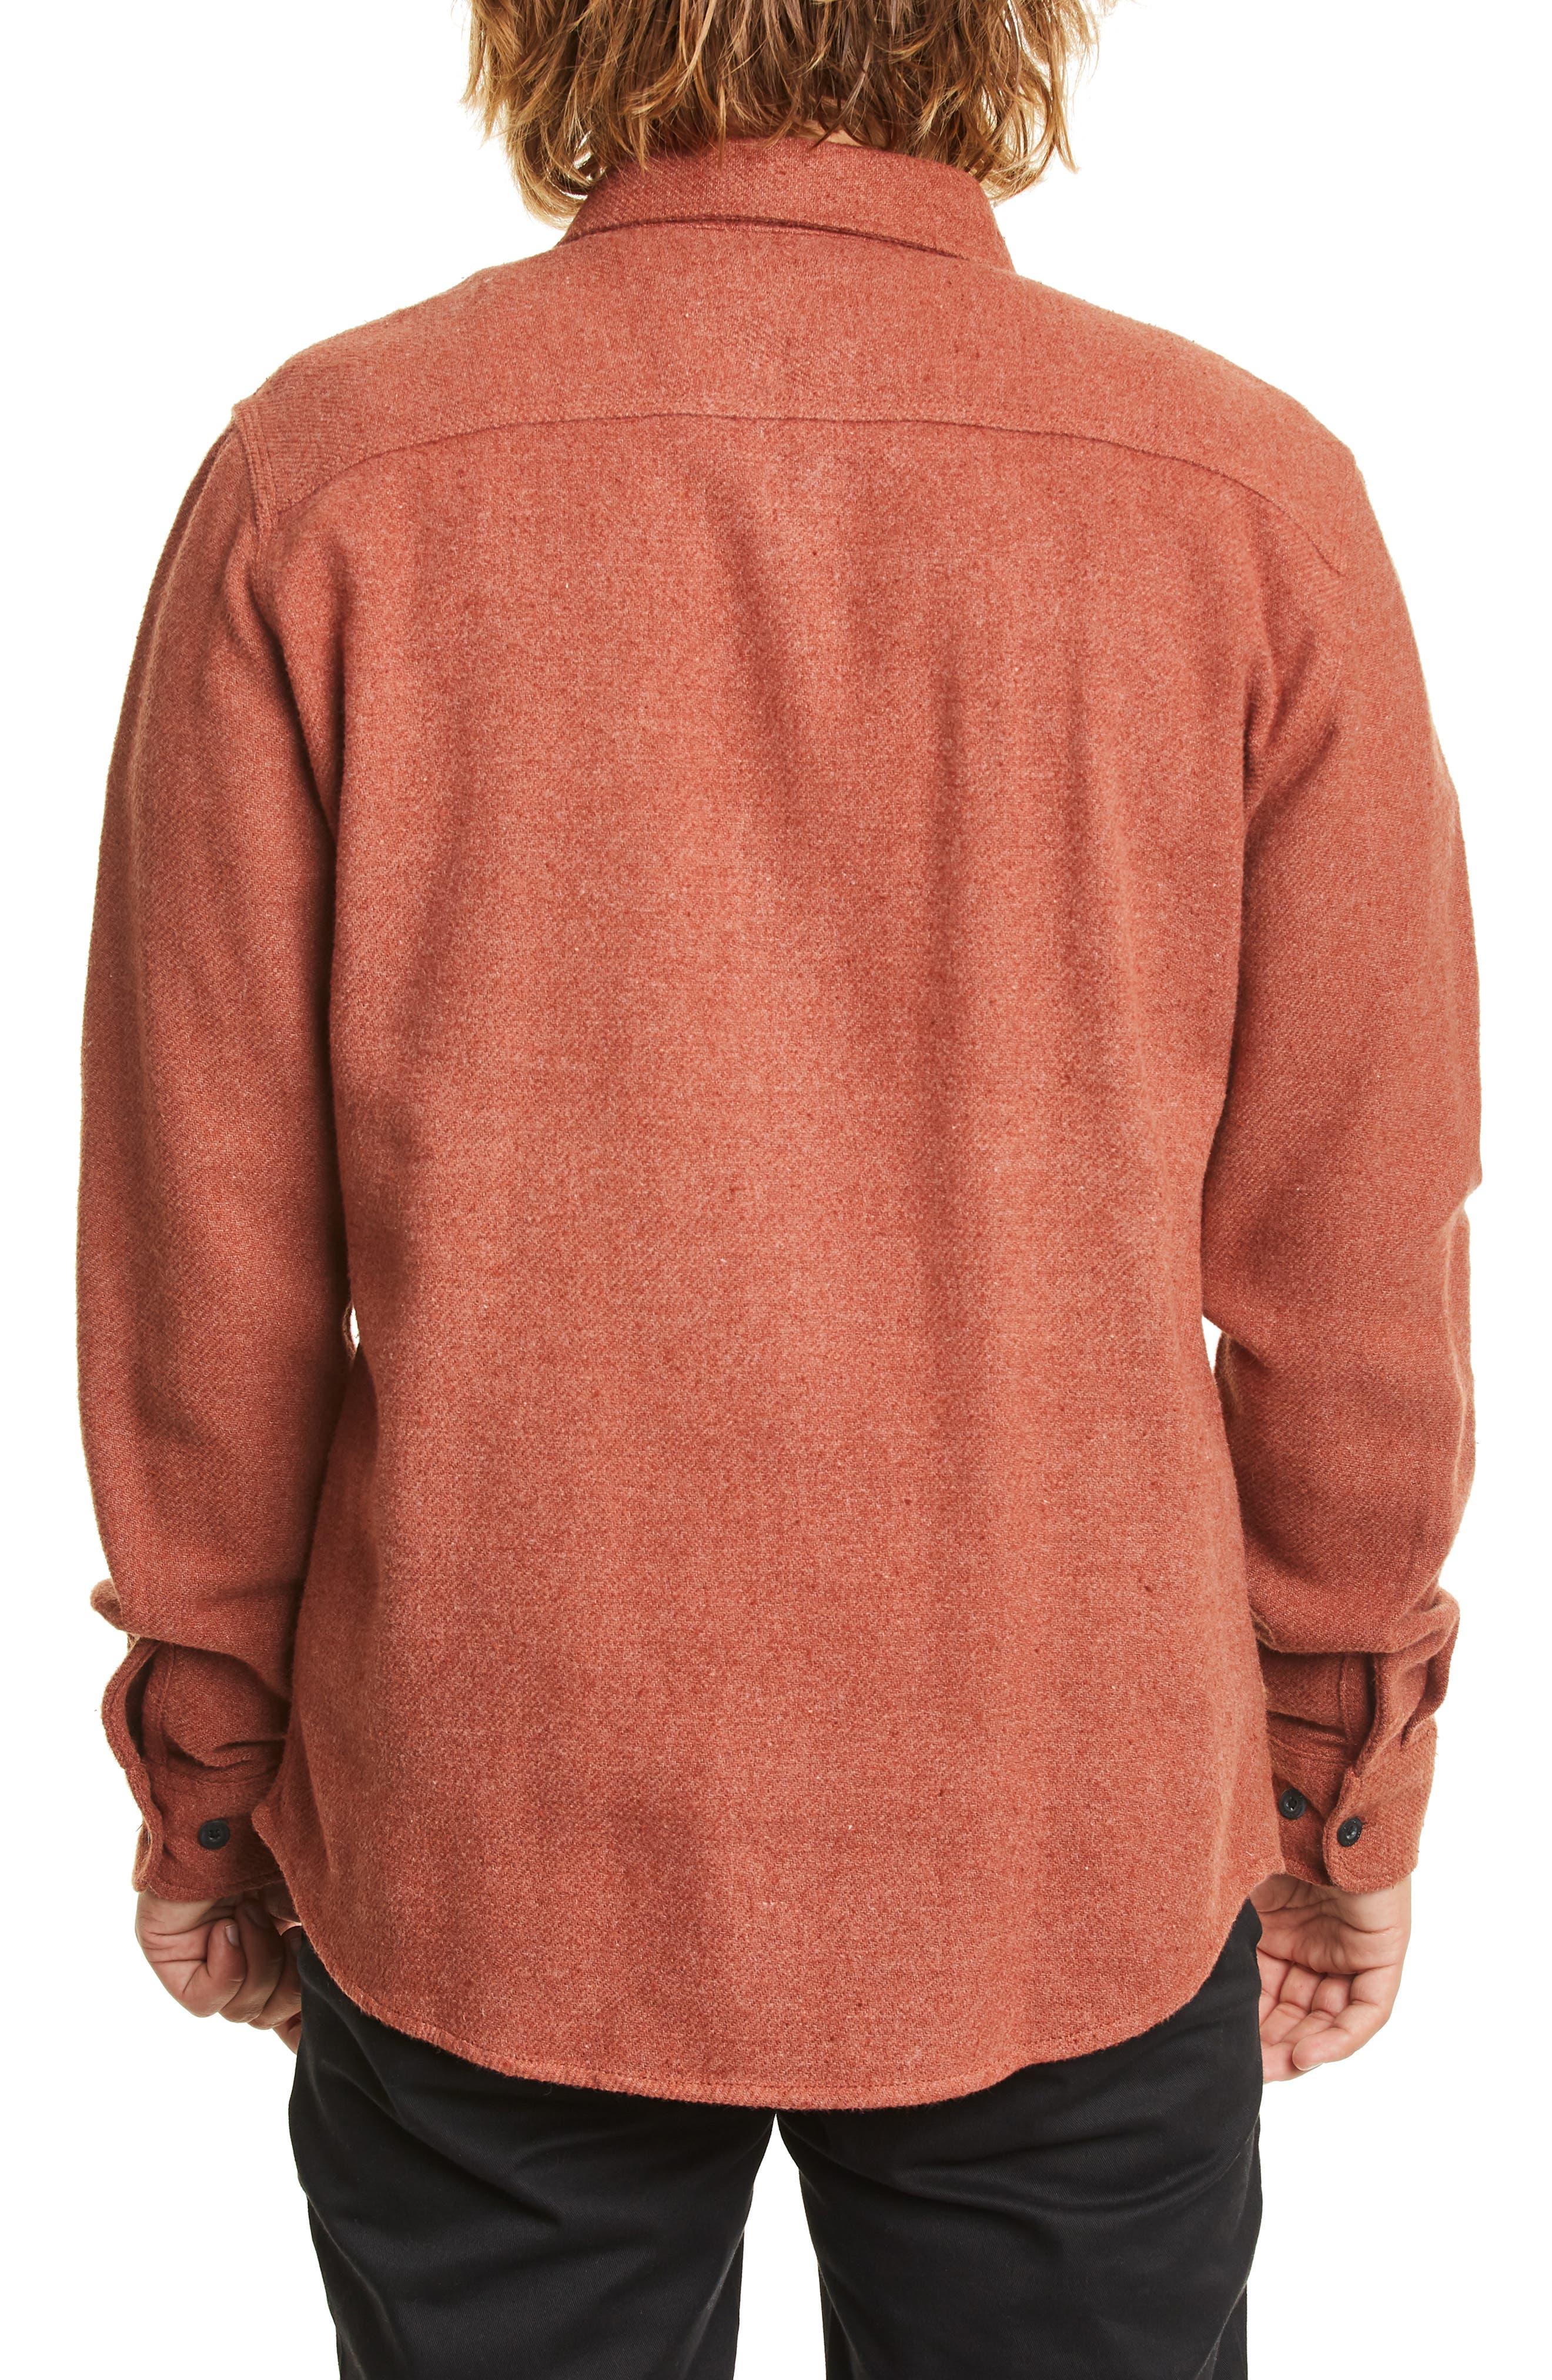 BRIXTON,                             Bowery Twill Work Shirt,                             Alternate thumbnail 2, color,                             CLAY